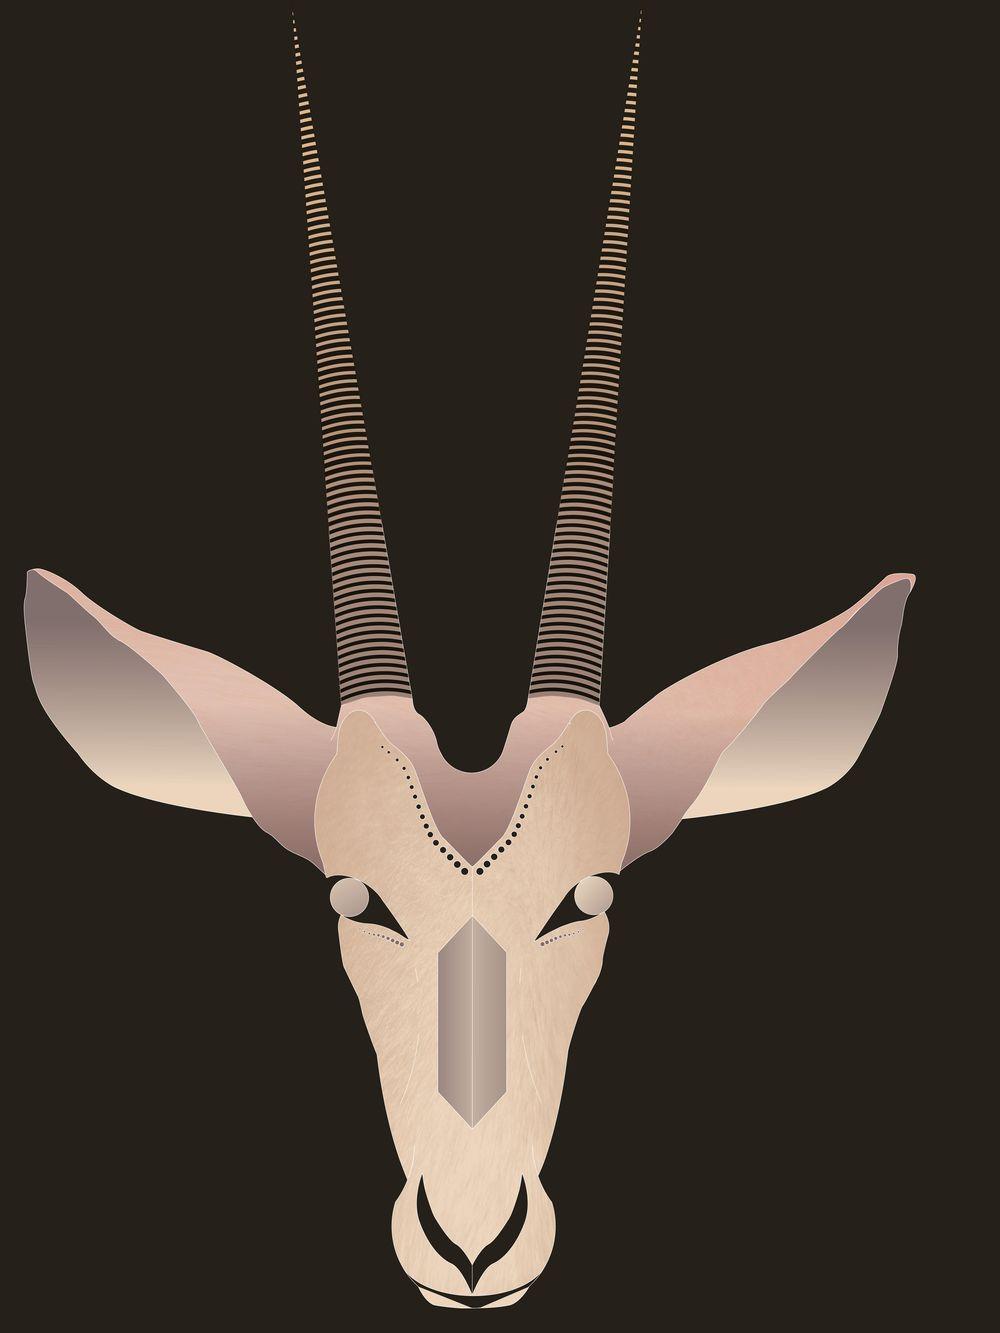 Arabian Oryx - image 1 - student project